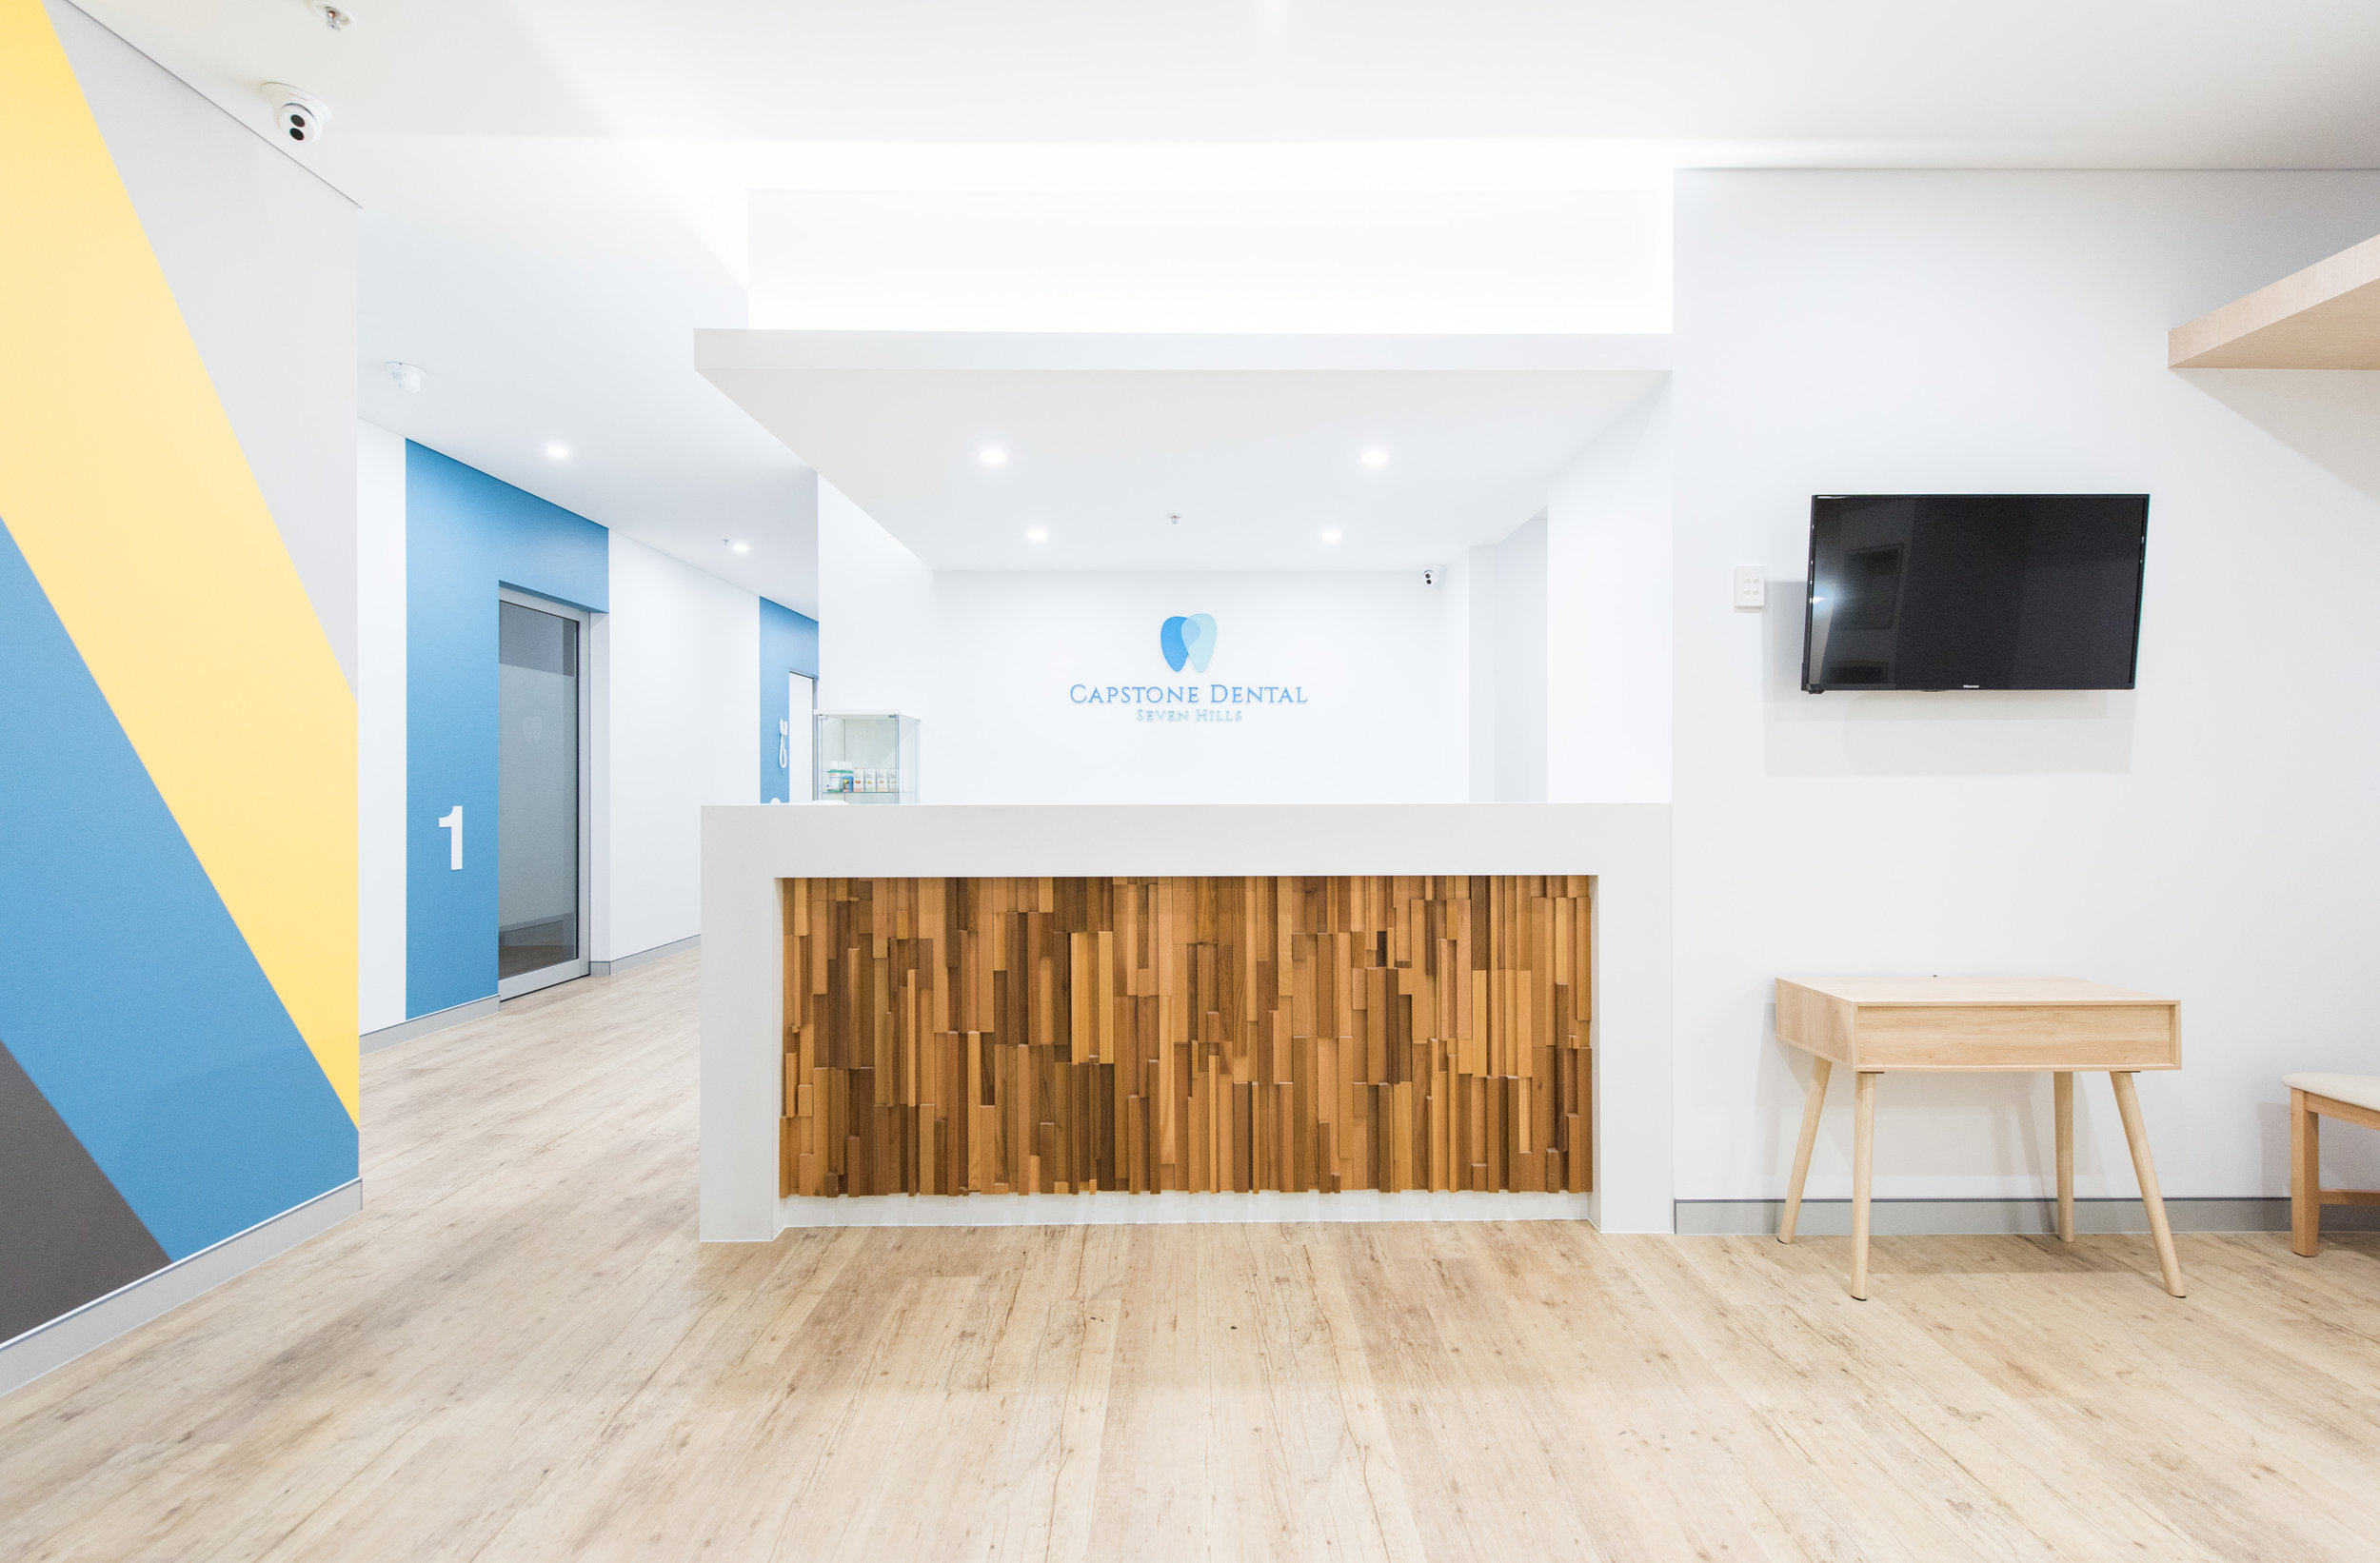 Capstone Dental TV Waiting Room